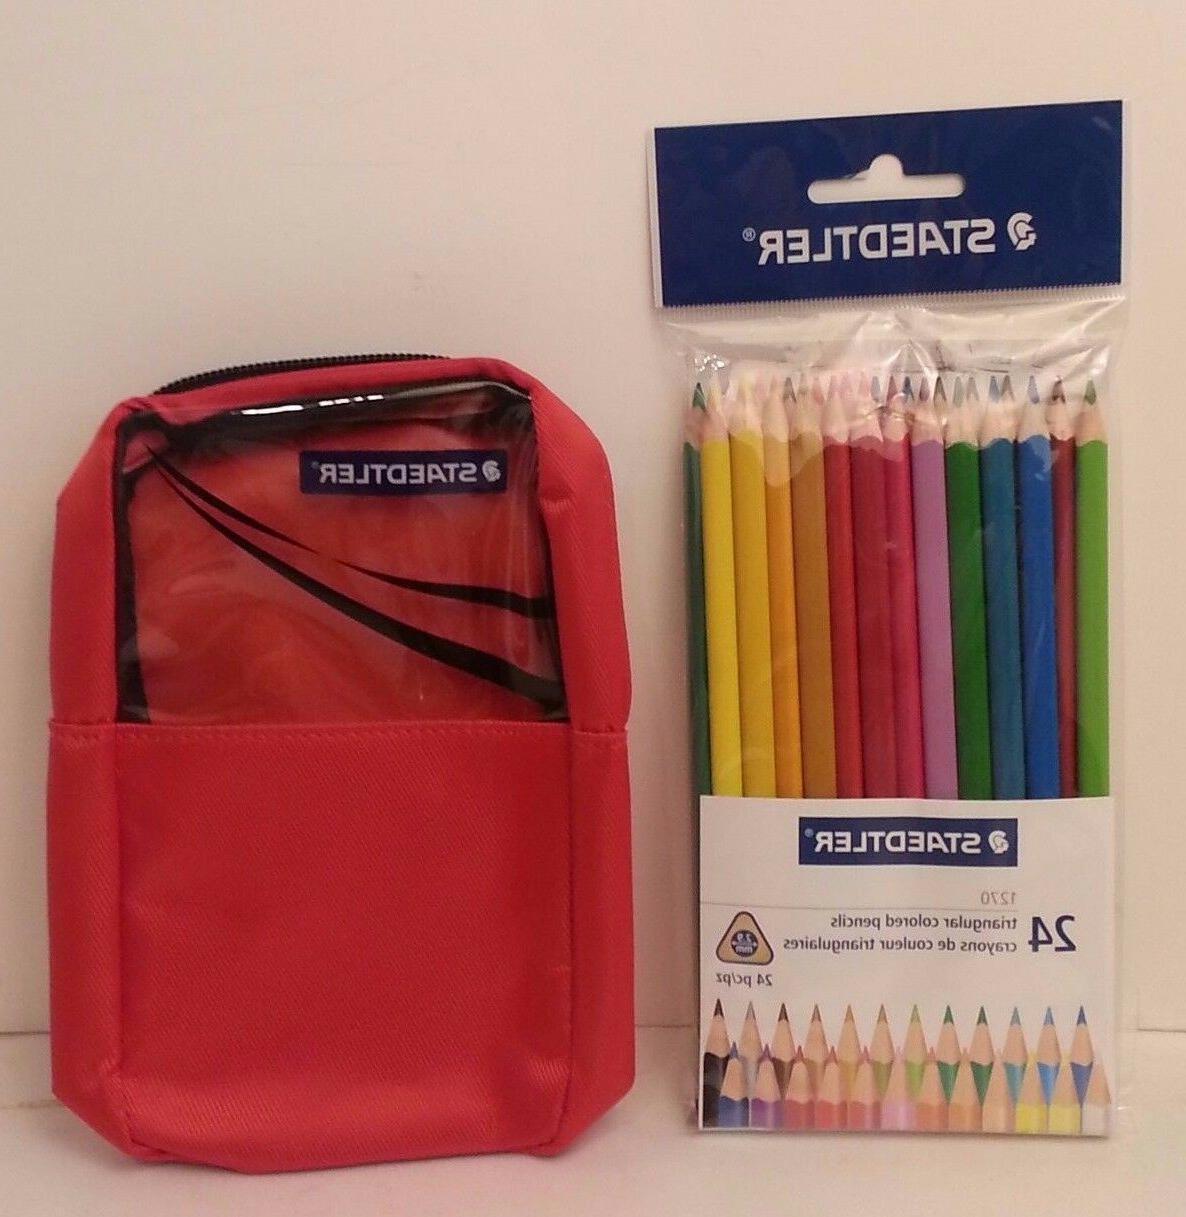 STAEDTLER 24 CT Triangular Pencil Color